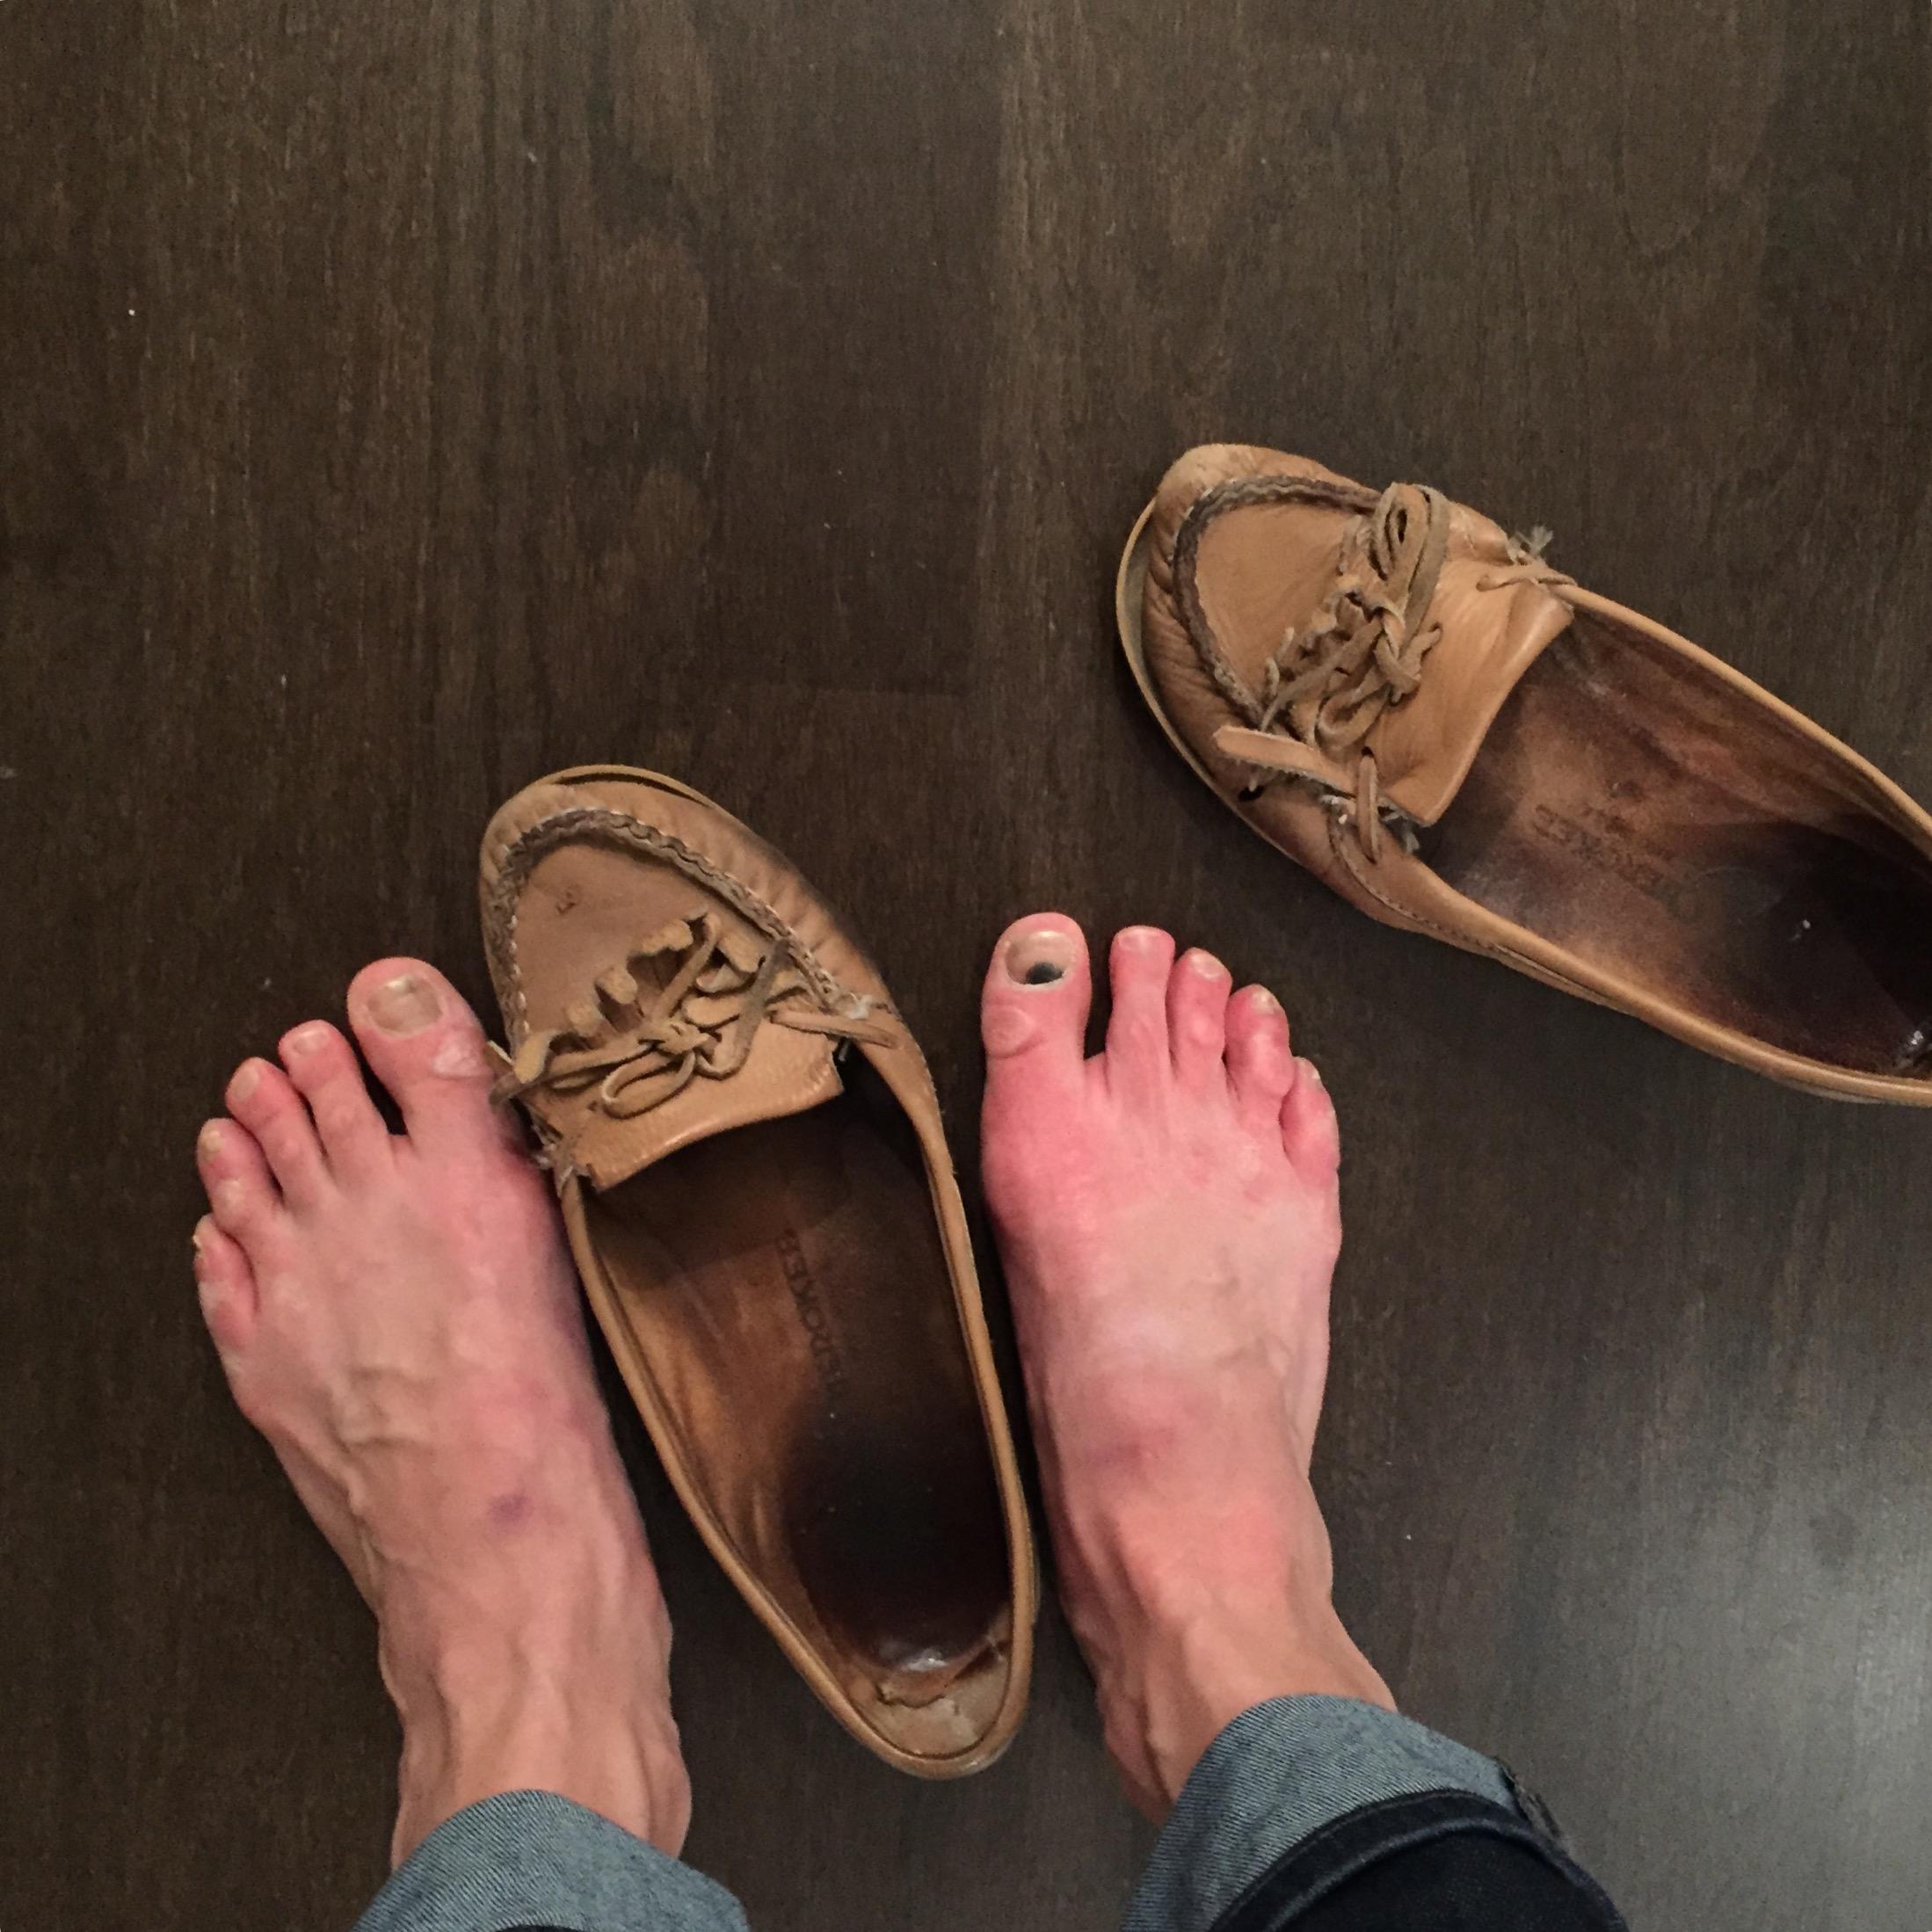 Leaked Feet Jessica Eye naked photo 2017